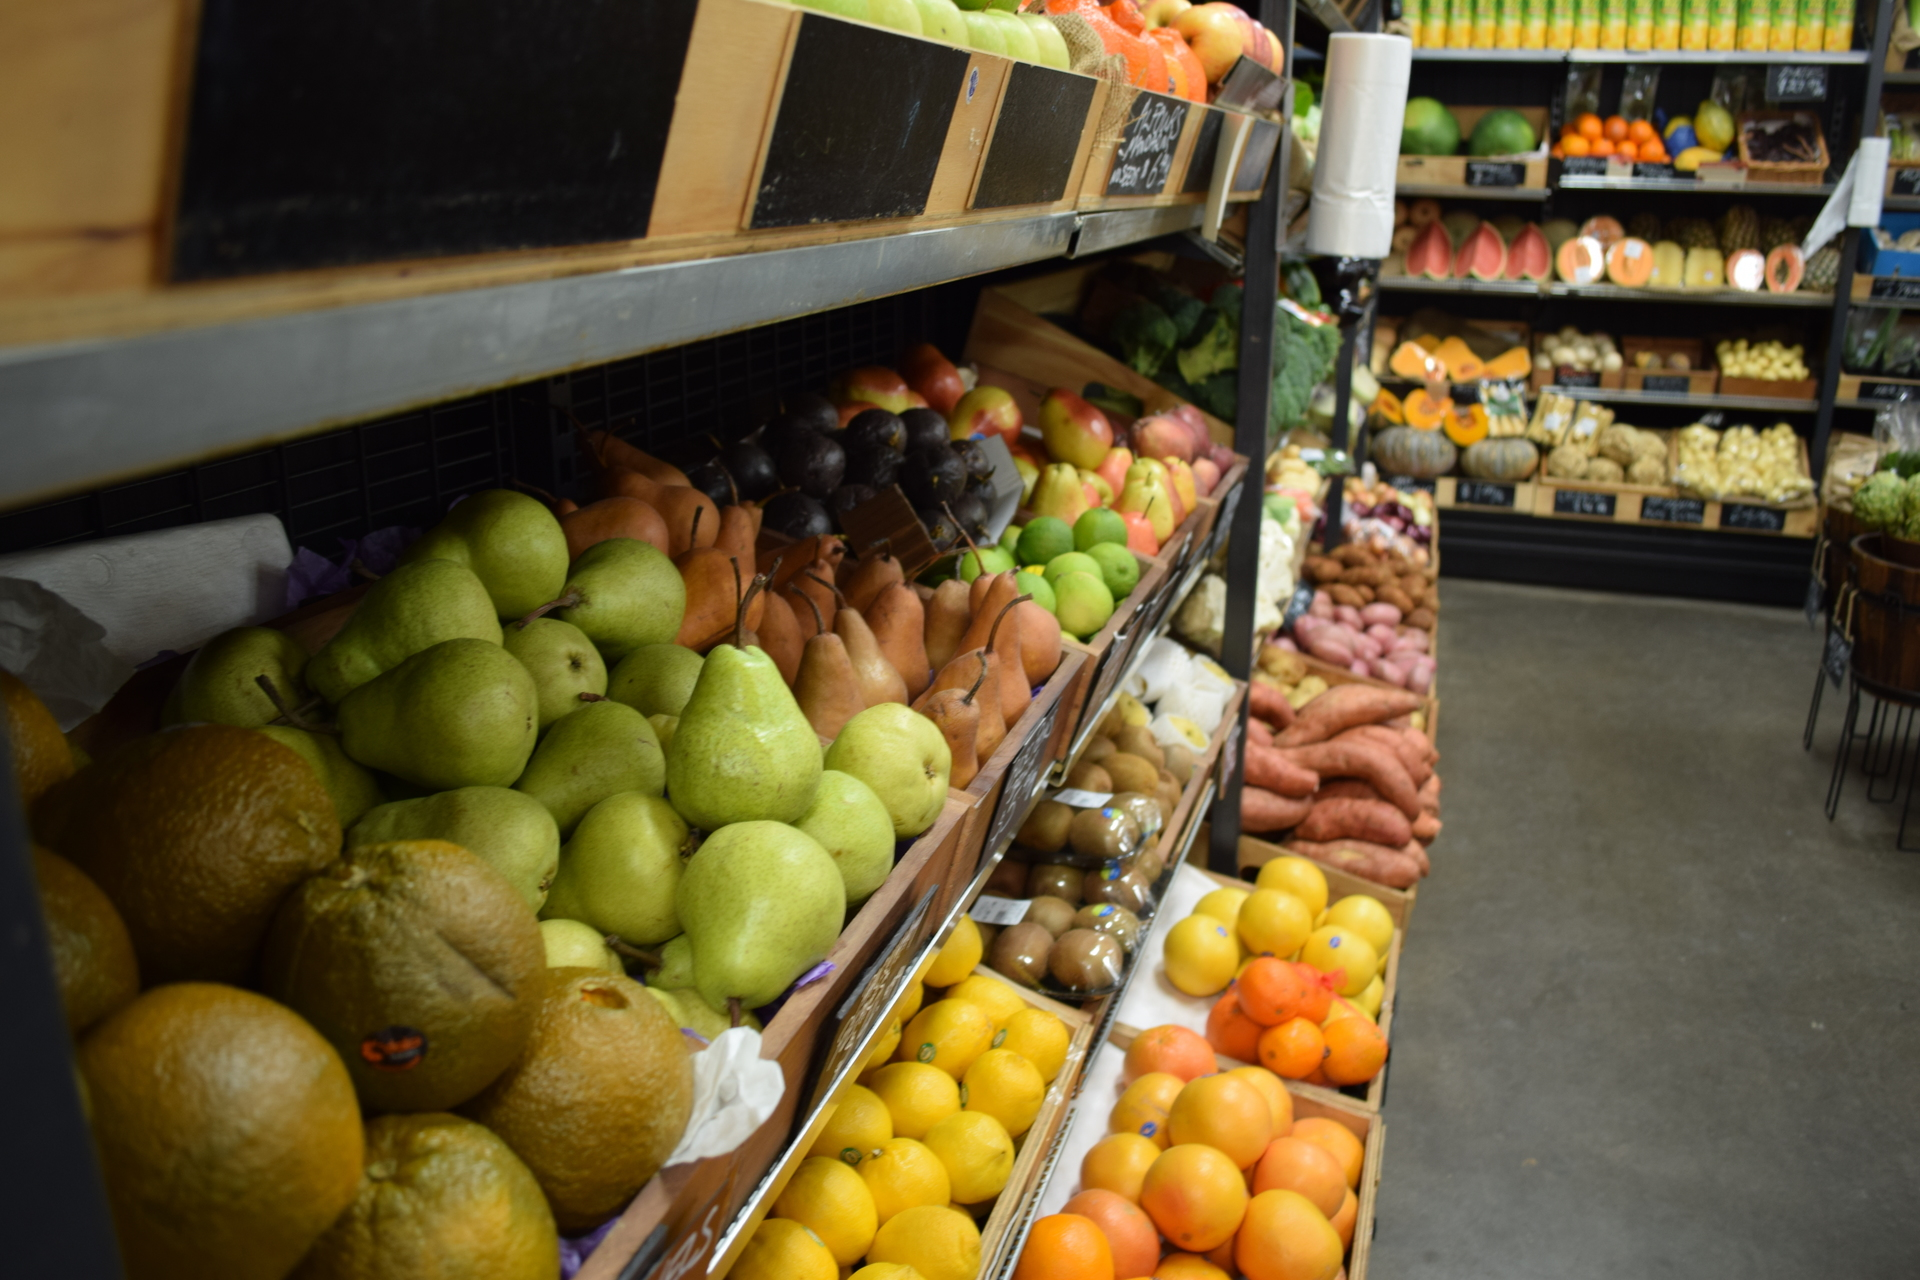 Iconic Food Store and cafe Business - Mornington Peninsula T/O 3.6 Million